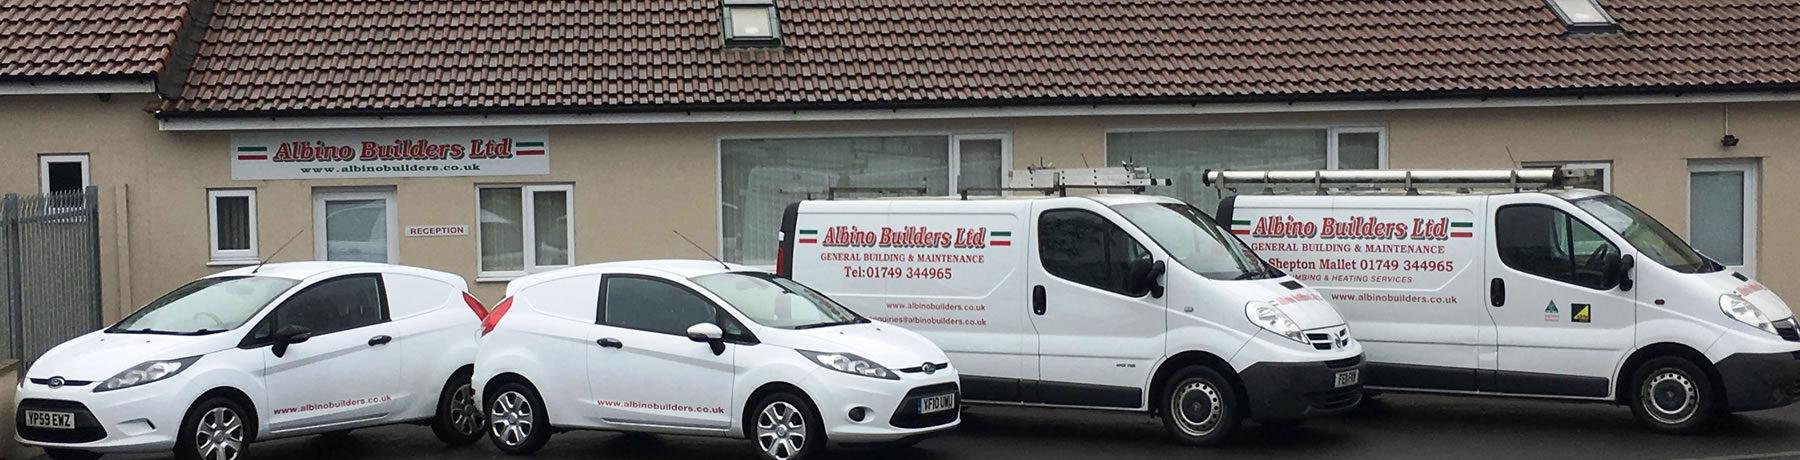 Home Vans Banner Image